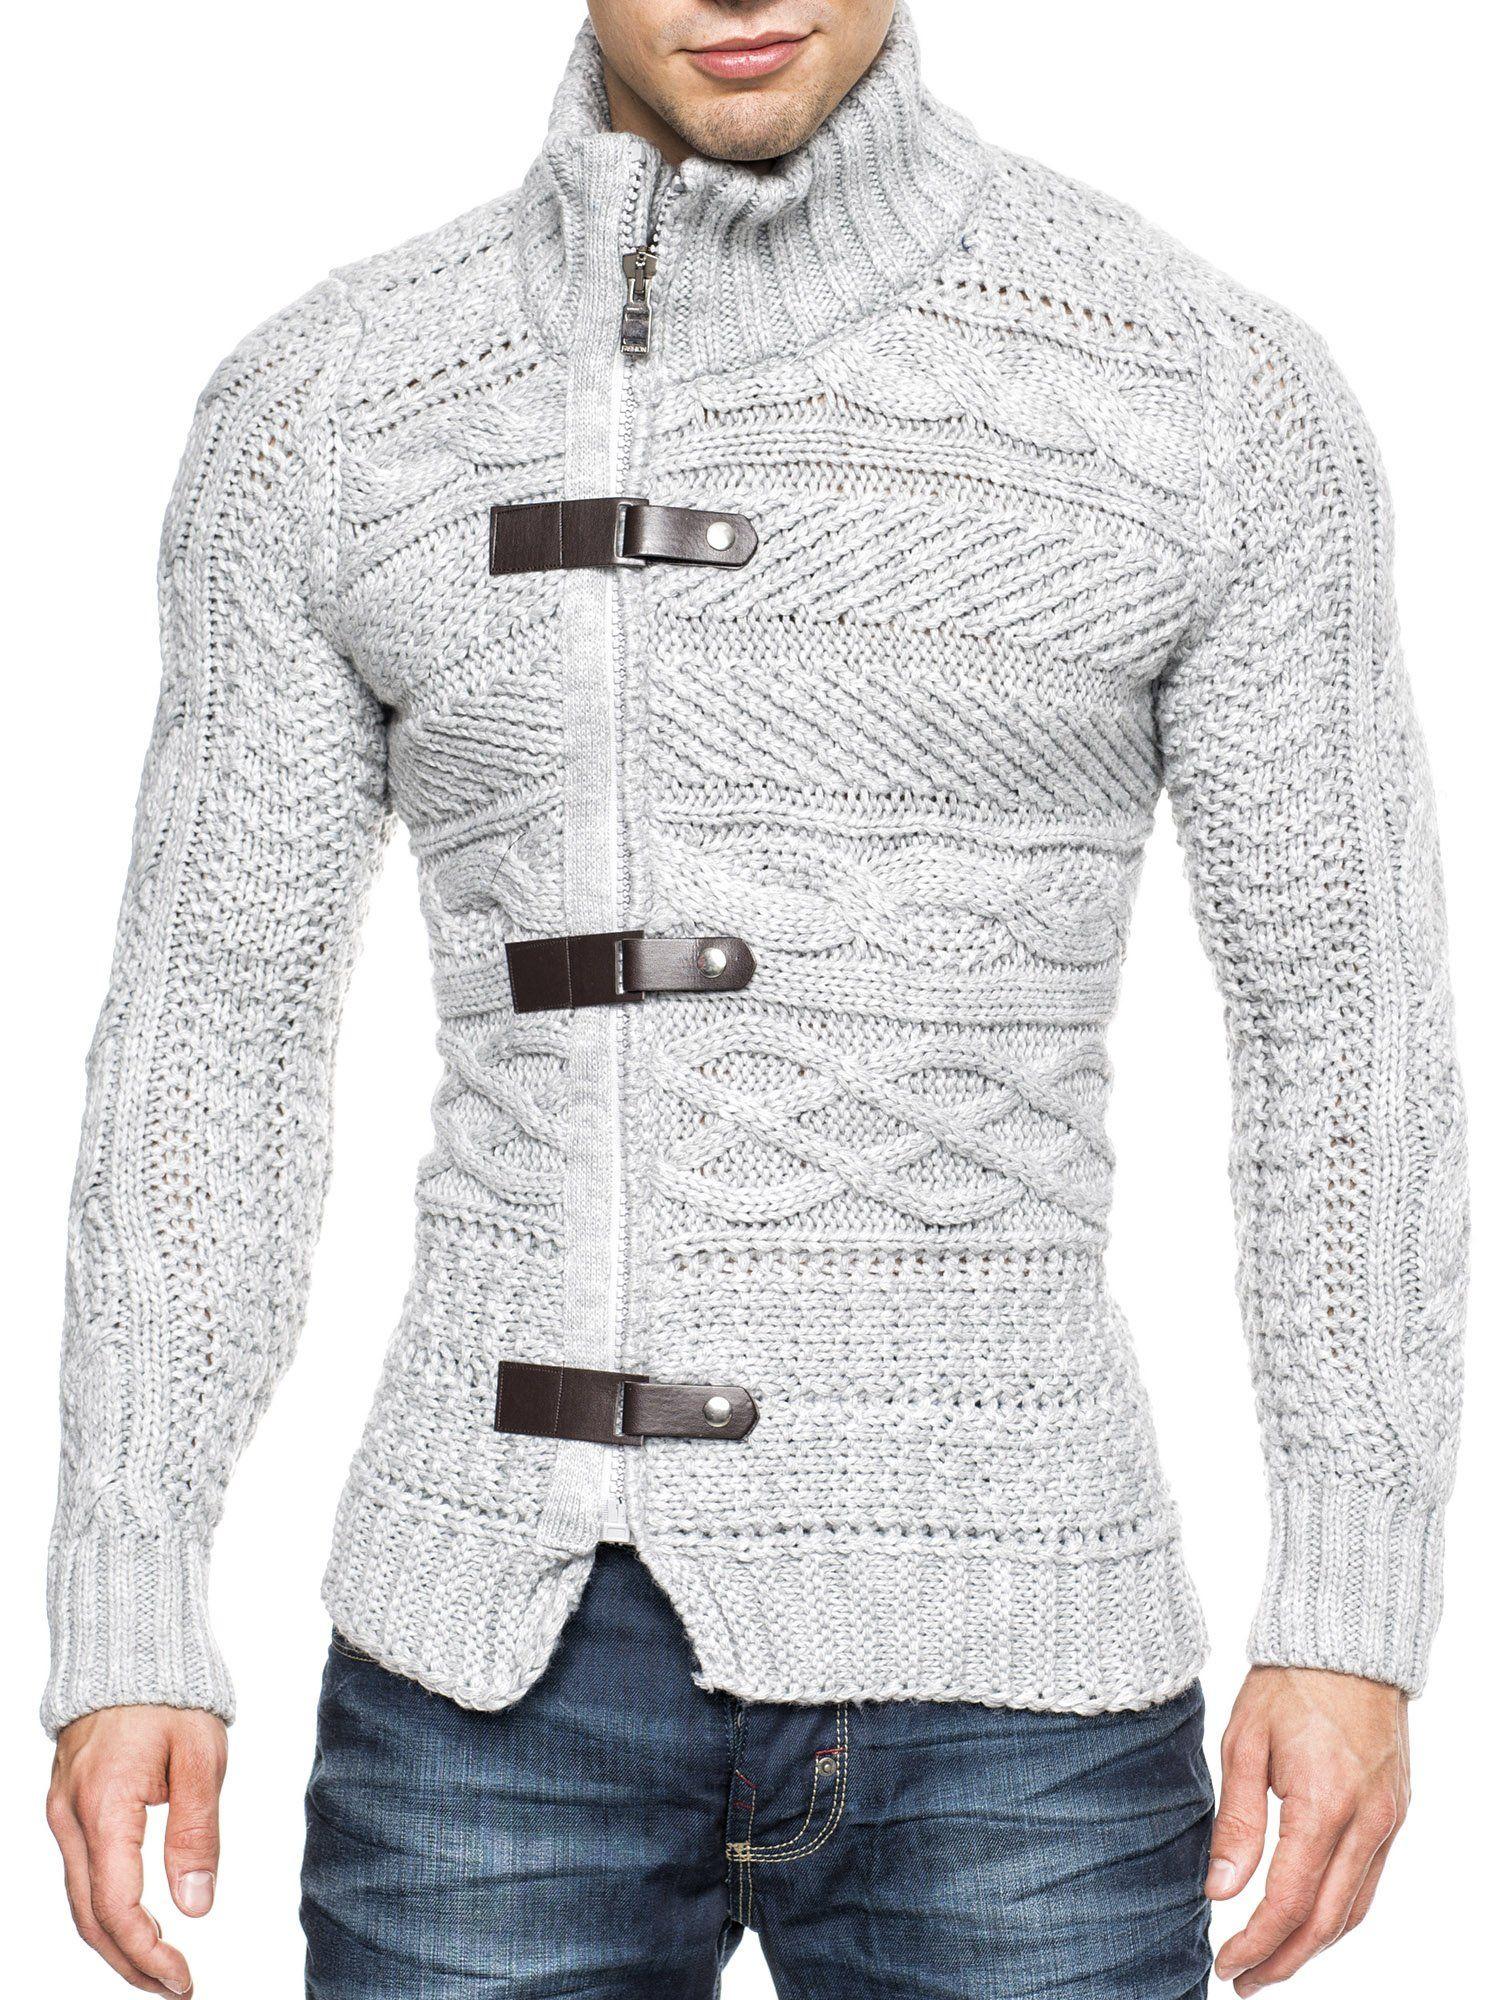 herren pullover balandi herren strickjacke strick pullover jacke hoodie hoody herren pullover marken strick pullover jacke hoodie hoody